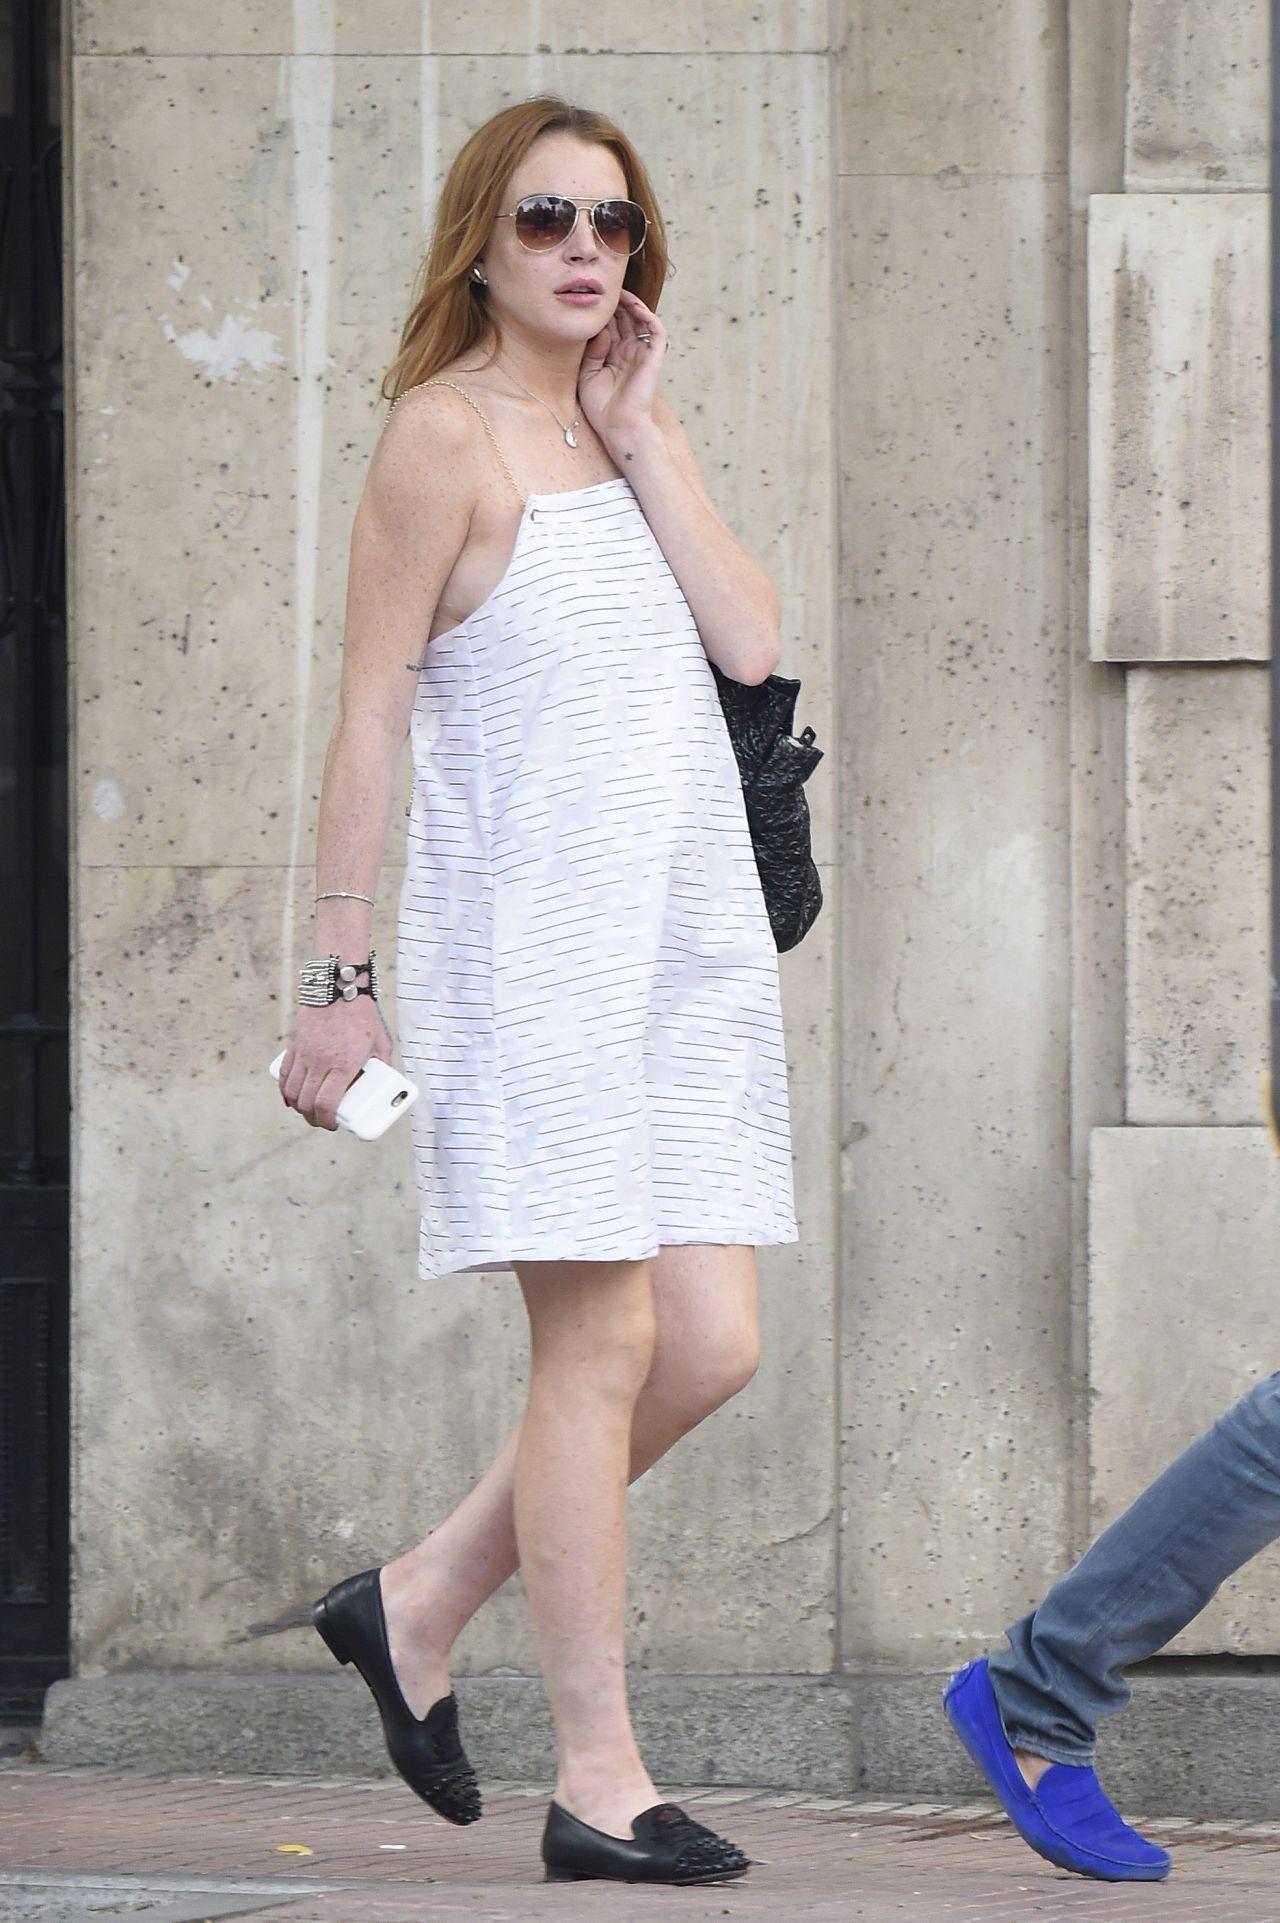 Lindsay Lohan Summer Outfit Ideas